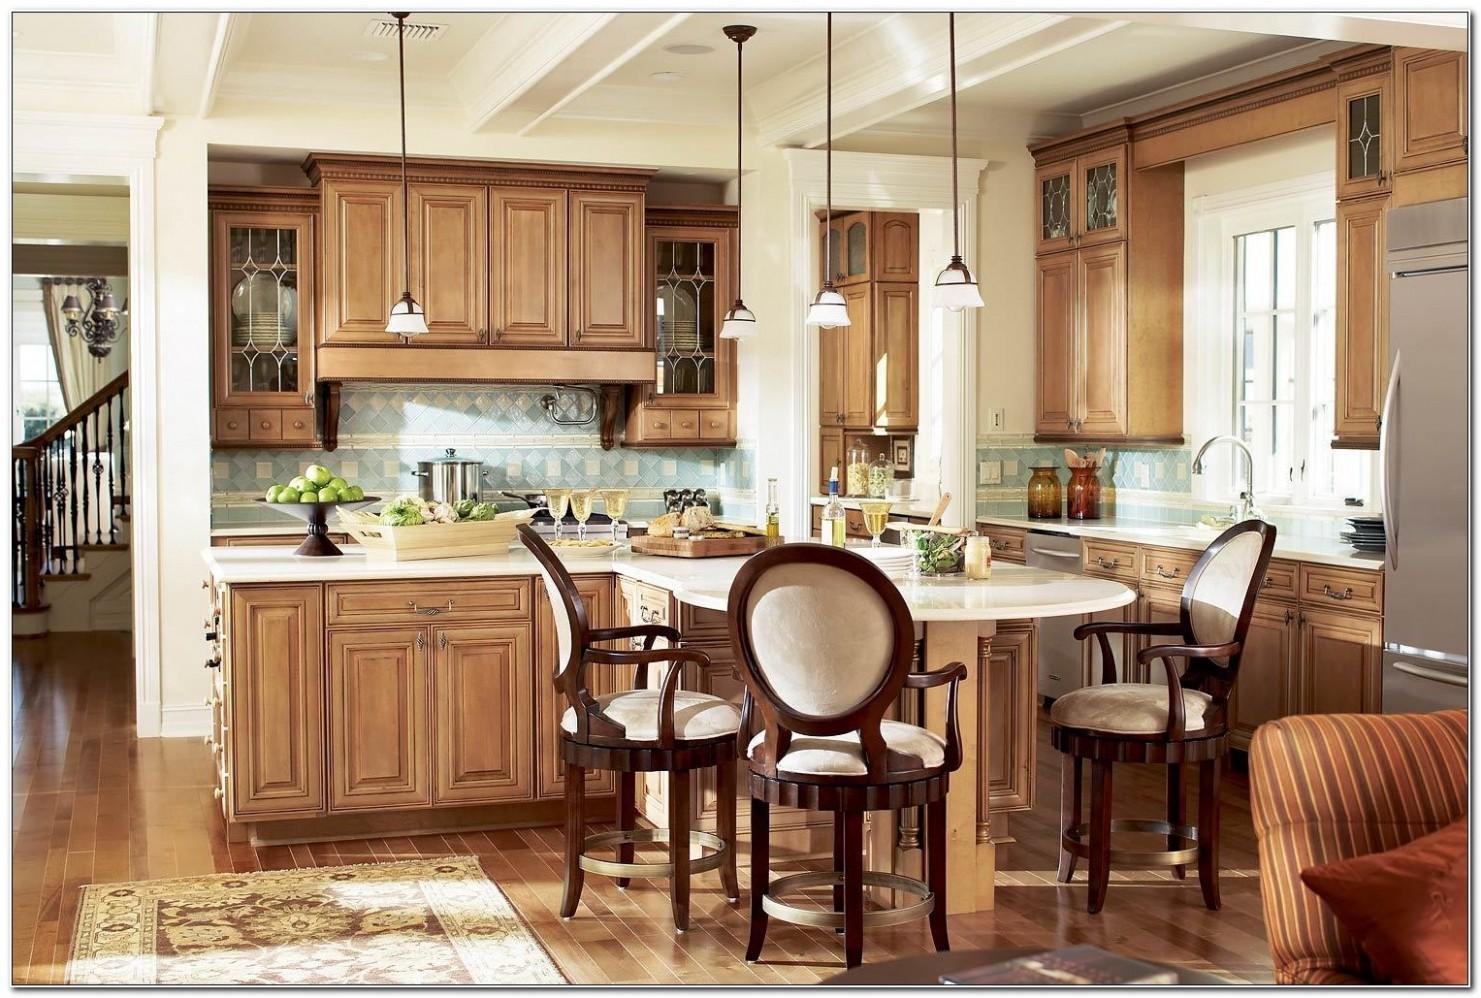 Maple Mocha Glaze Kitchen Cabinets - Cabinet : Home Design Ideas  - Titan Maple Glaze Kitchen Cabinets